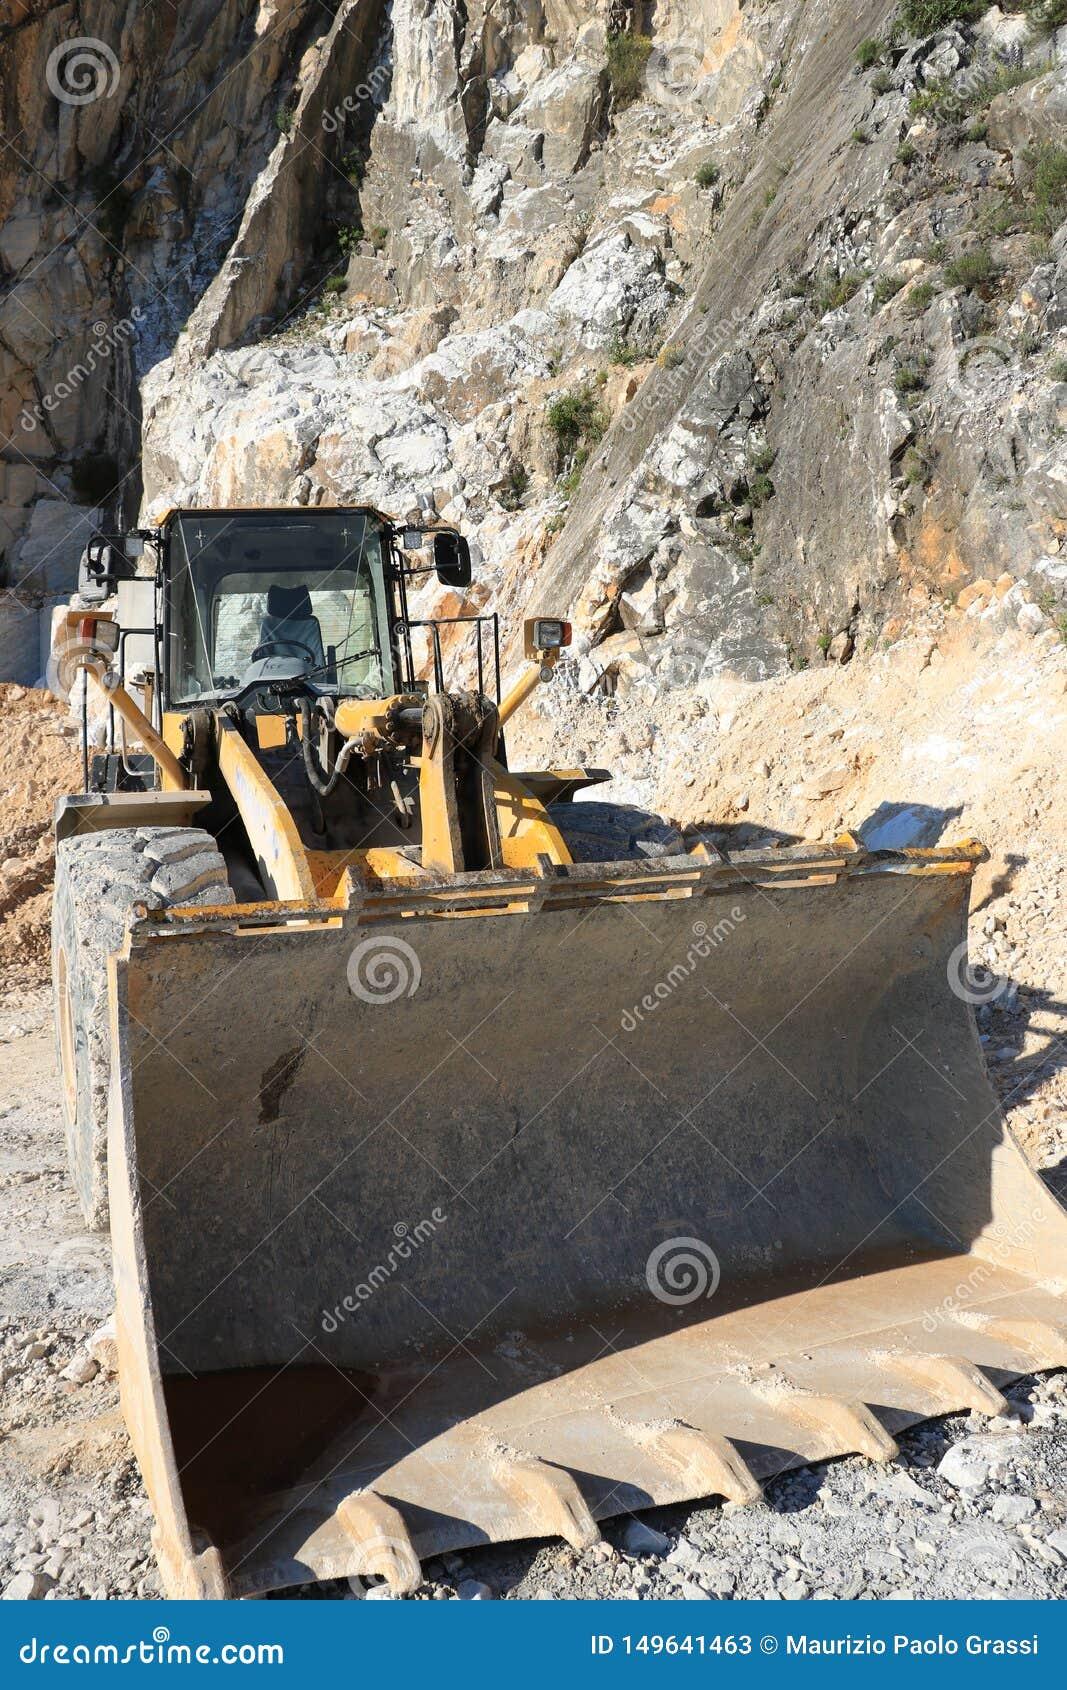 Bulldozer in a Carrara marble quarry. A large mechanical shovel